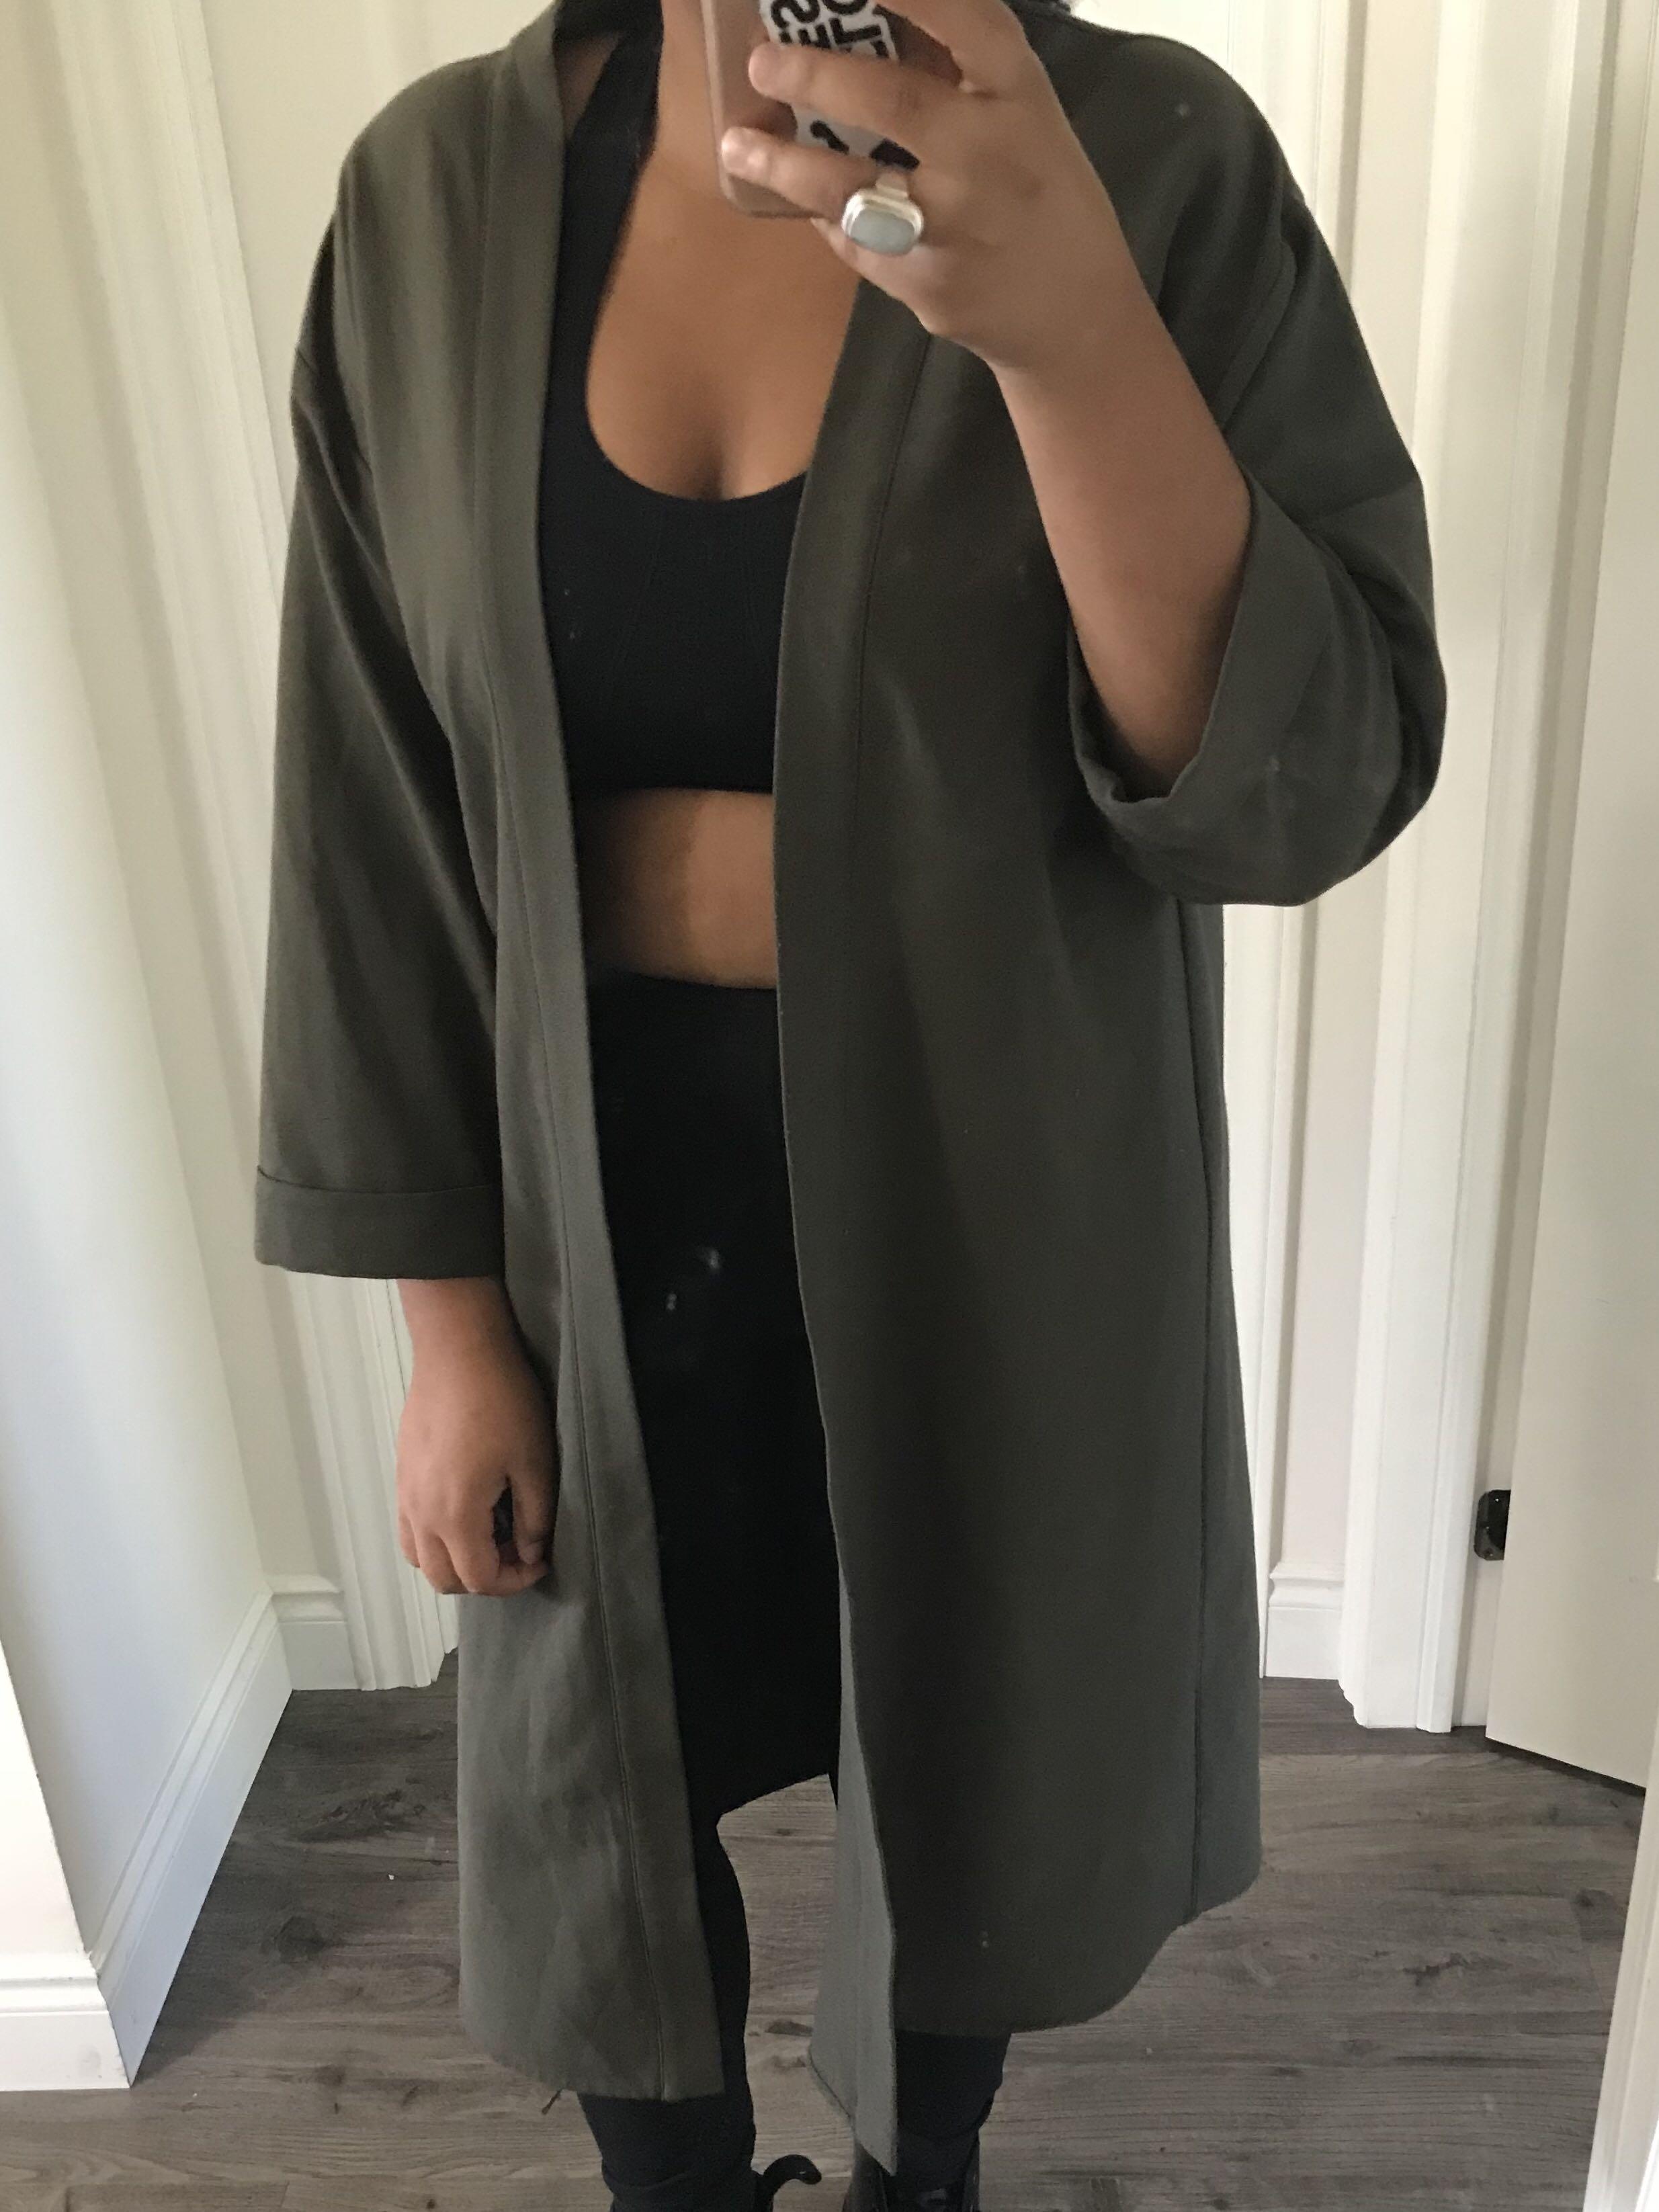 TOPSHOP duster jacket